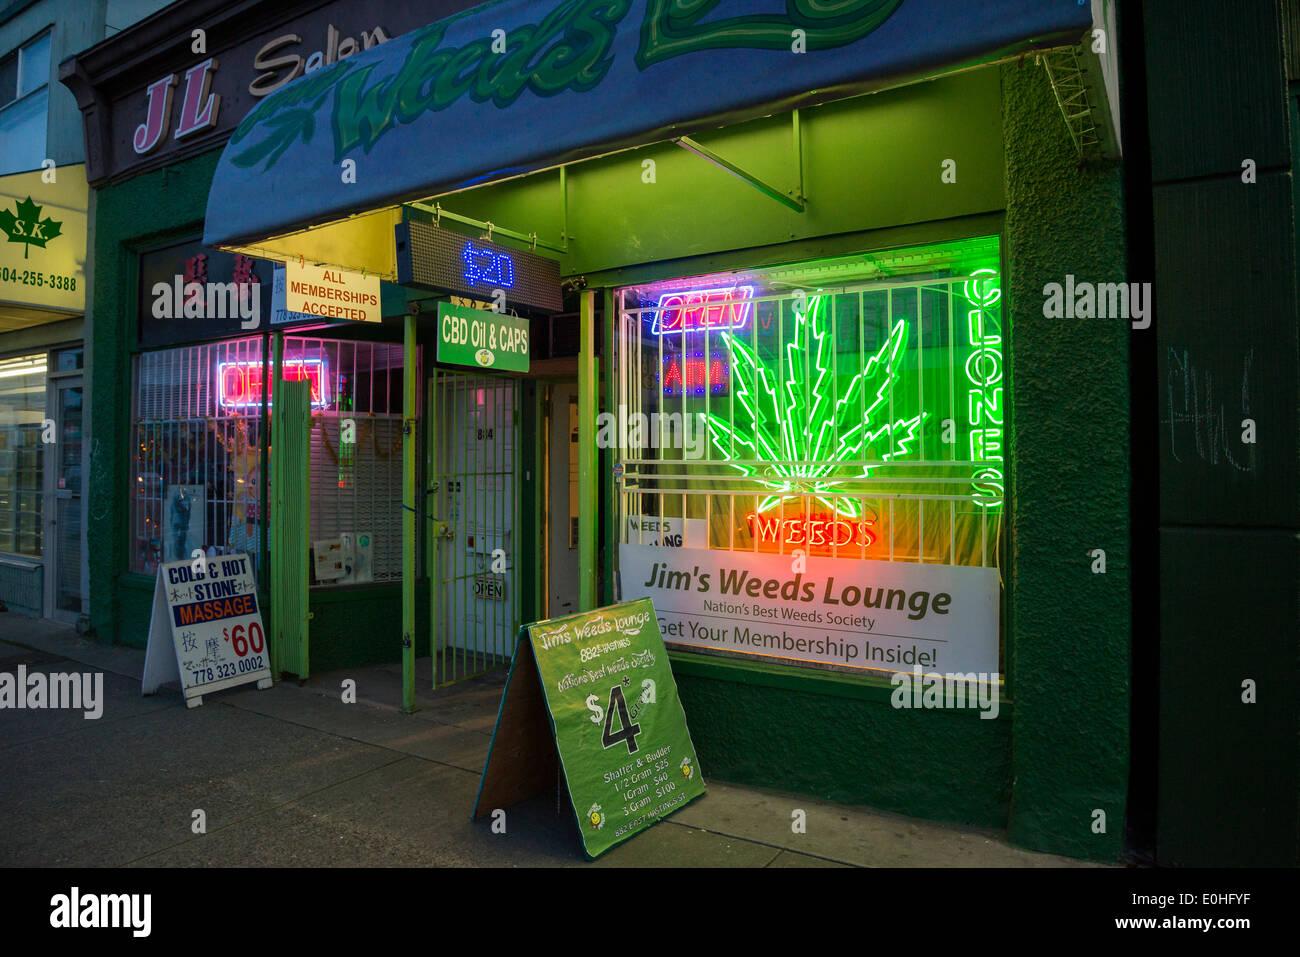 Les mauvaises herbes Jim's Lounge, un dispensaire de marijuana médicale, DOWNTOWN EASTSIDE, East Hastings Street, Vancouver, British Columbia, Canada Photo Stock